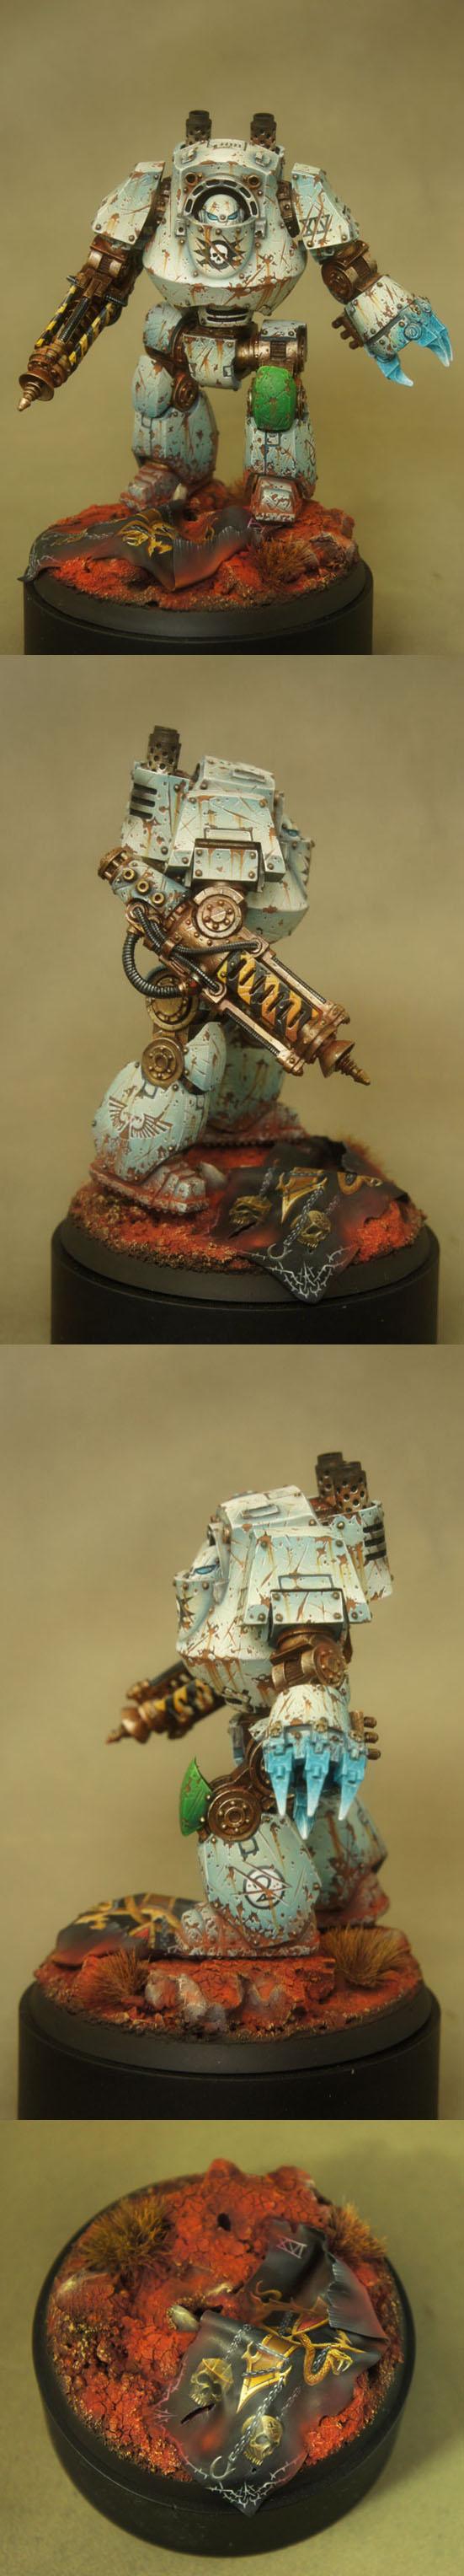 Loyalist Death Guard Contemptor